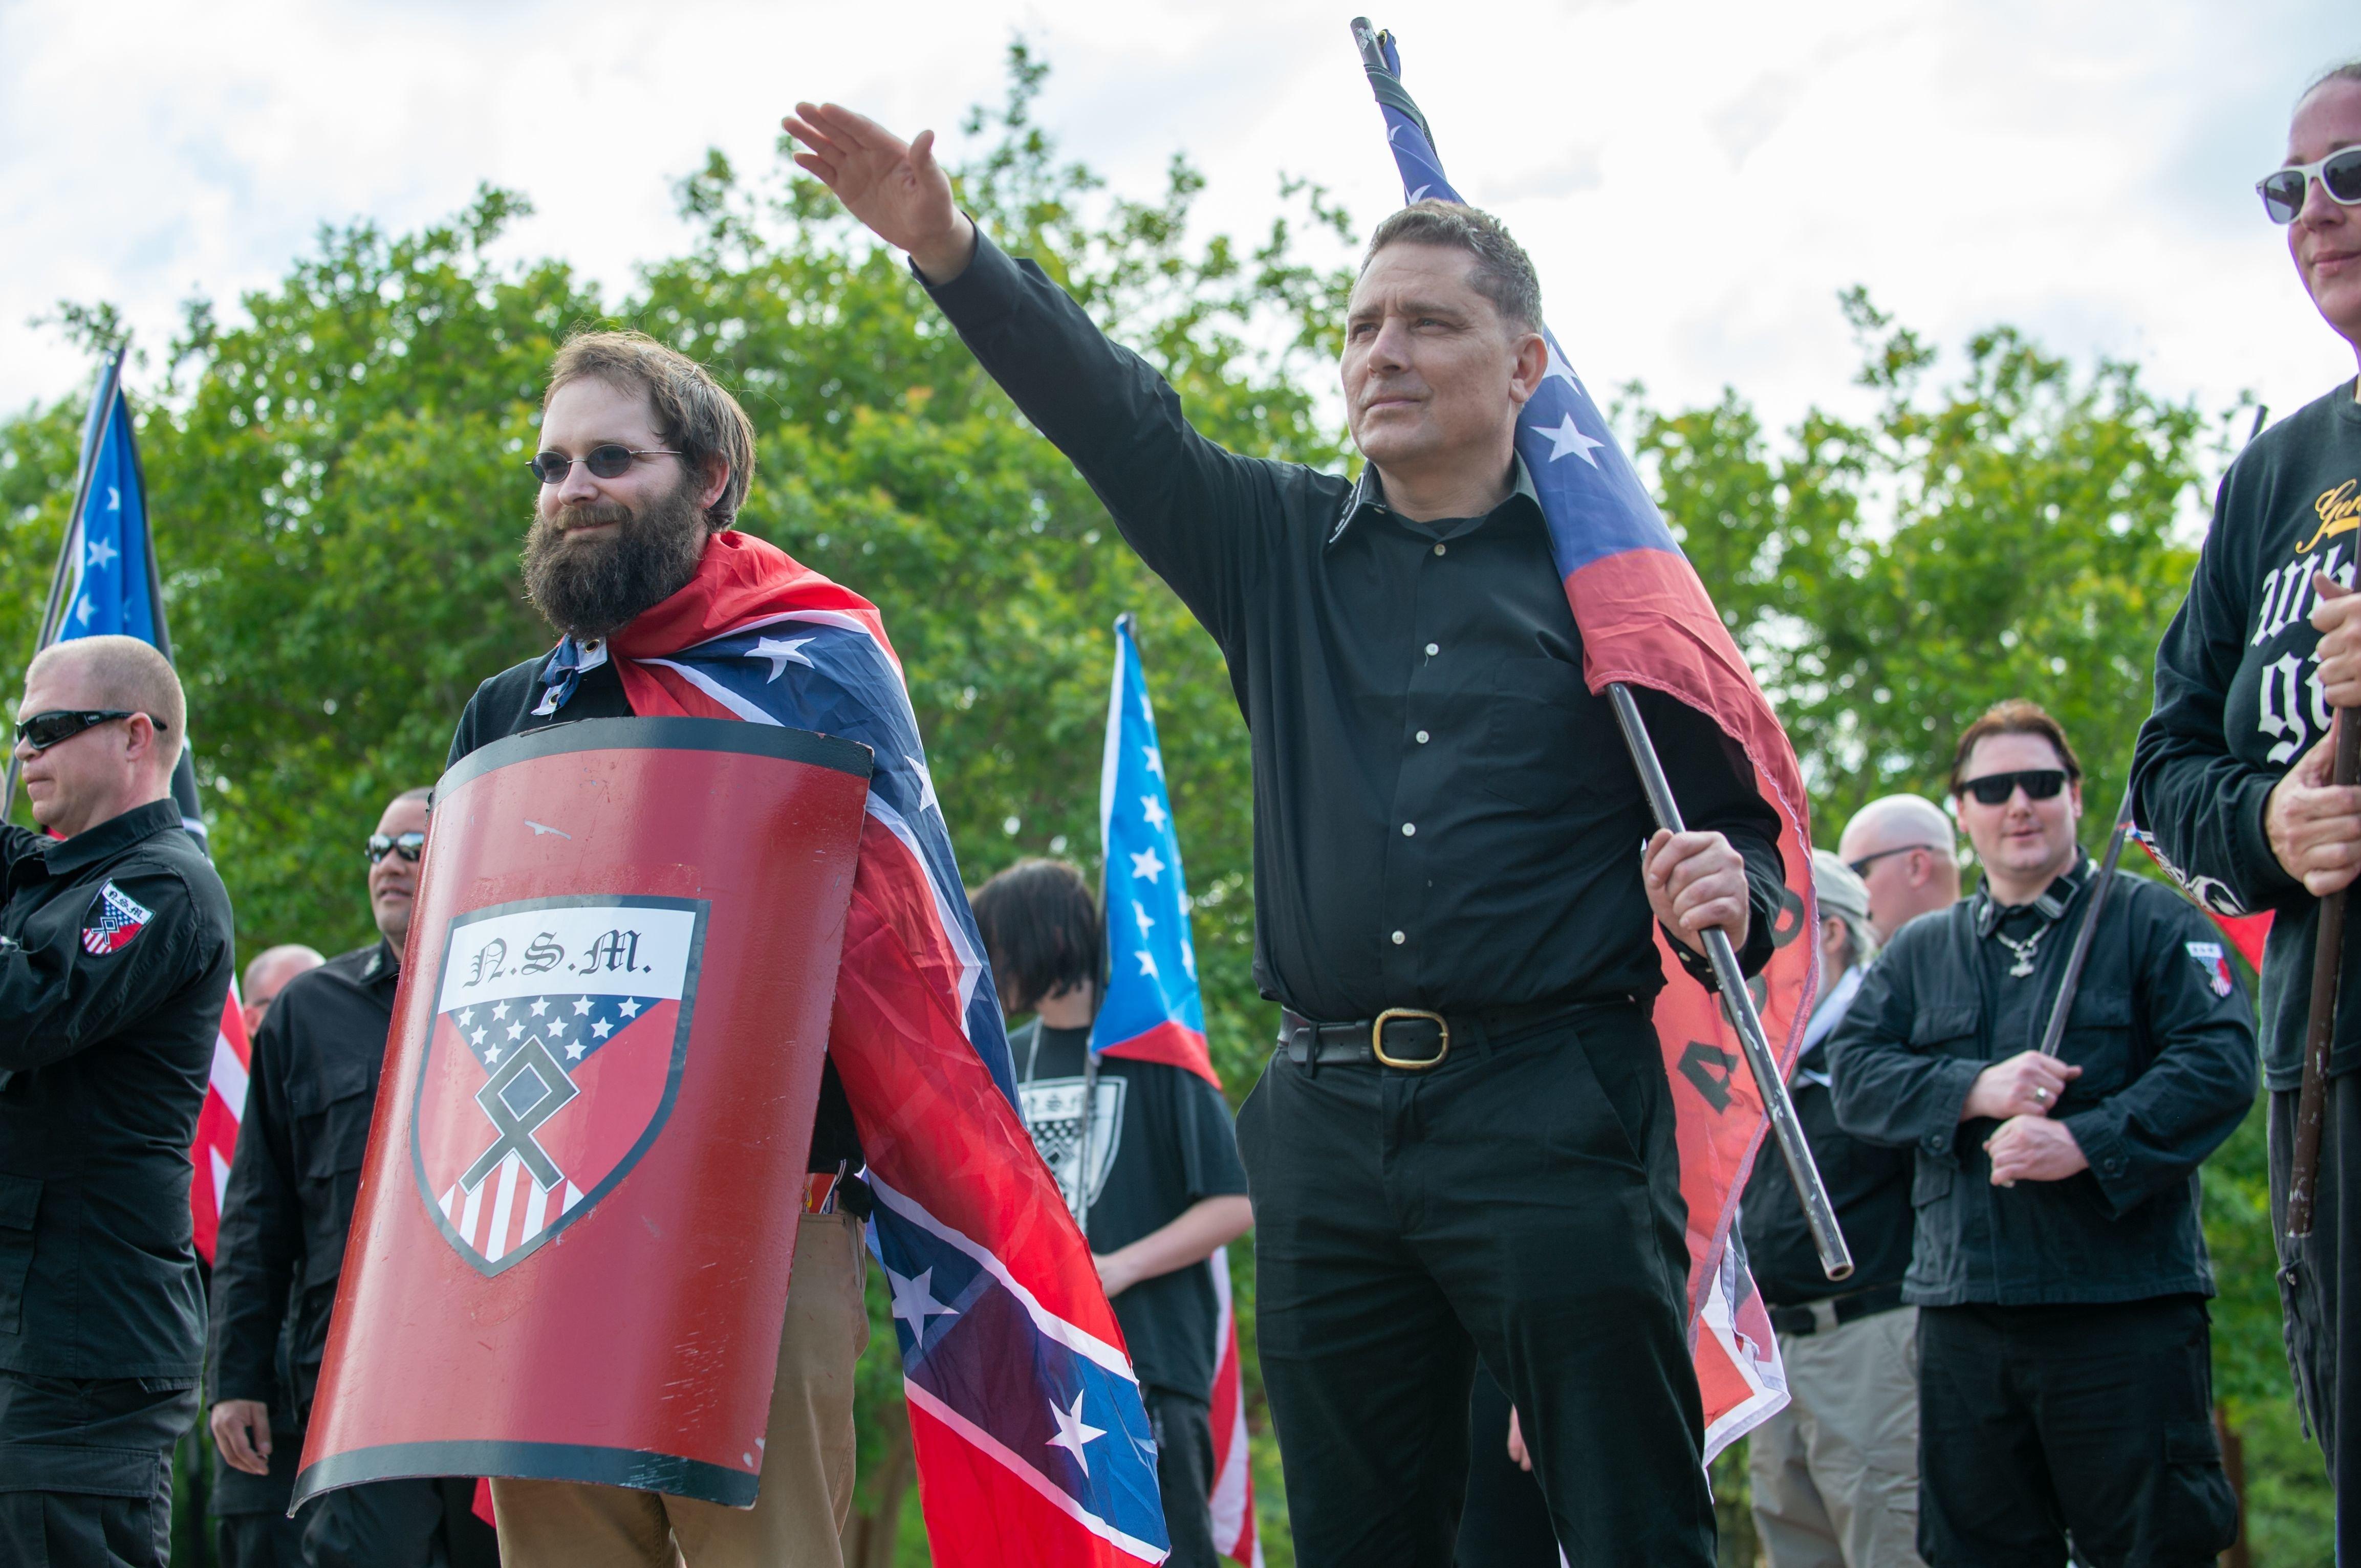 fascism Nazi politics hate racism xenophobia populism sociology